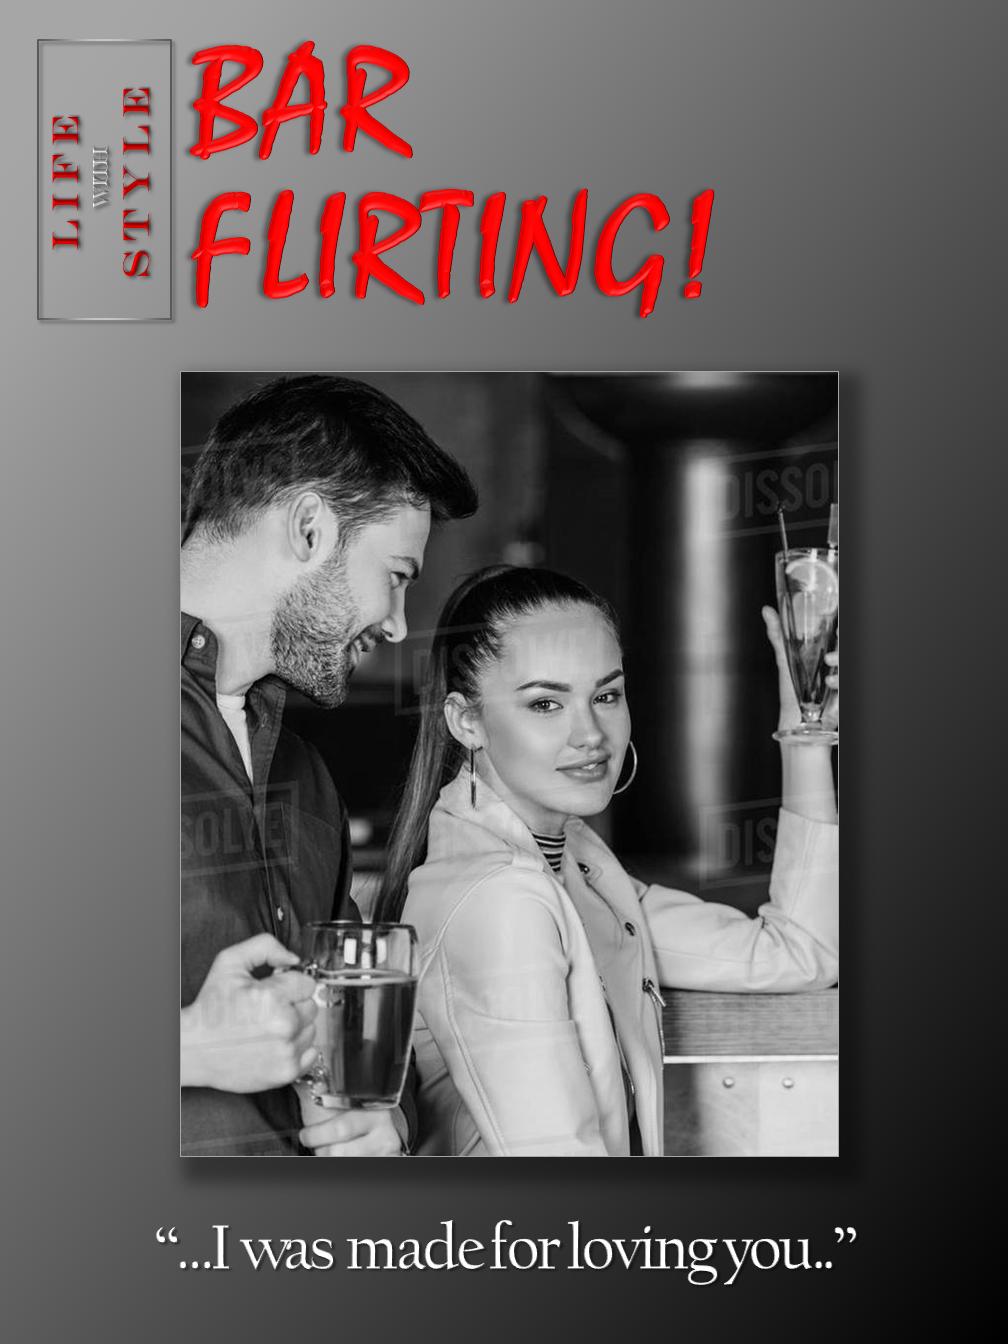 Bar Flirting